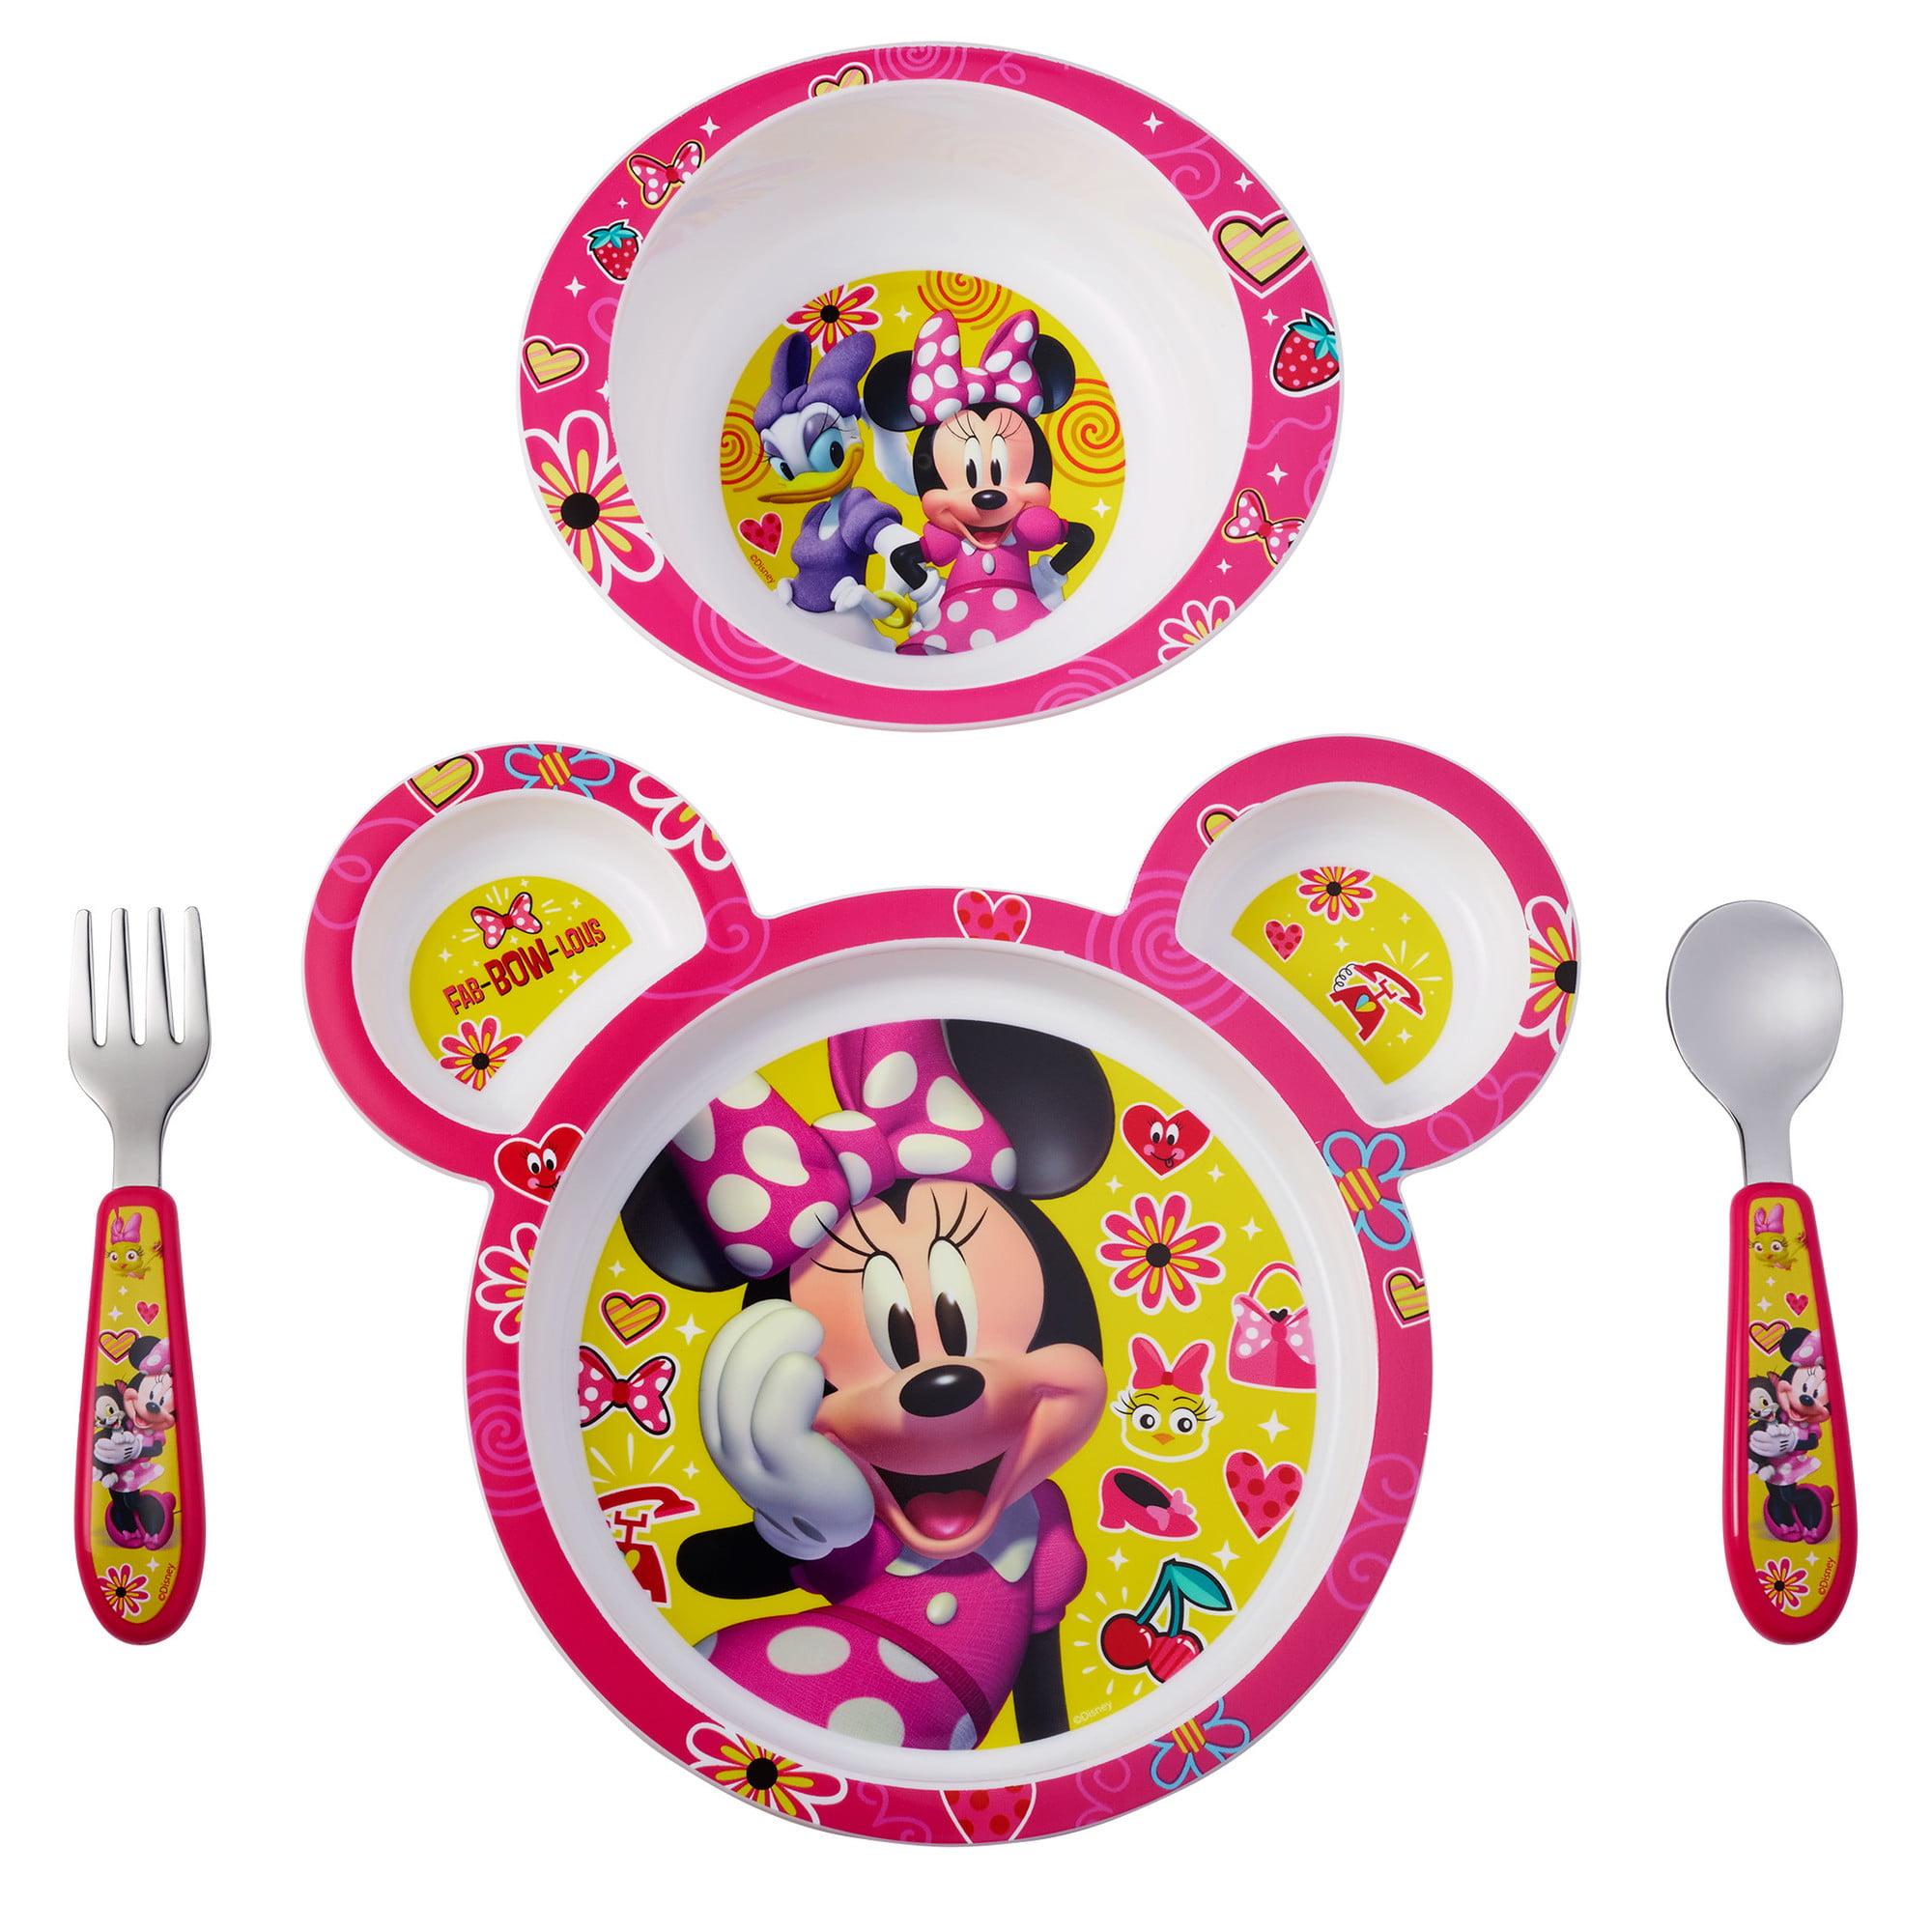 Disney Minnie Mouse Feeding Set Minnie Mouse Plate Bowl Knife Fork Set 4 Pieces Walmart Com Walmart Com